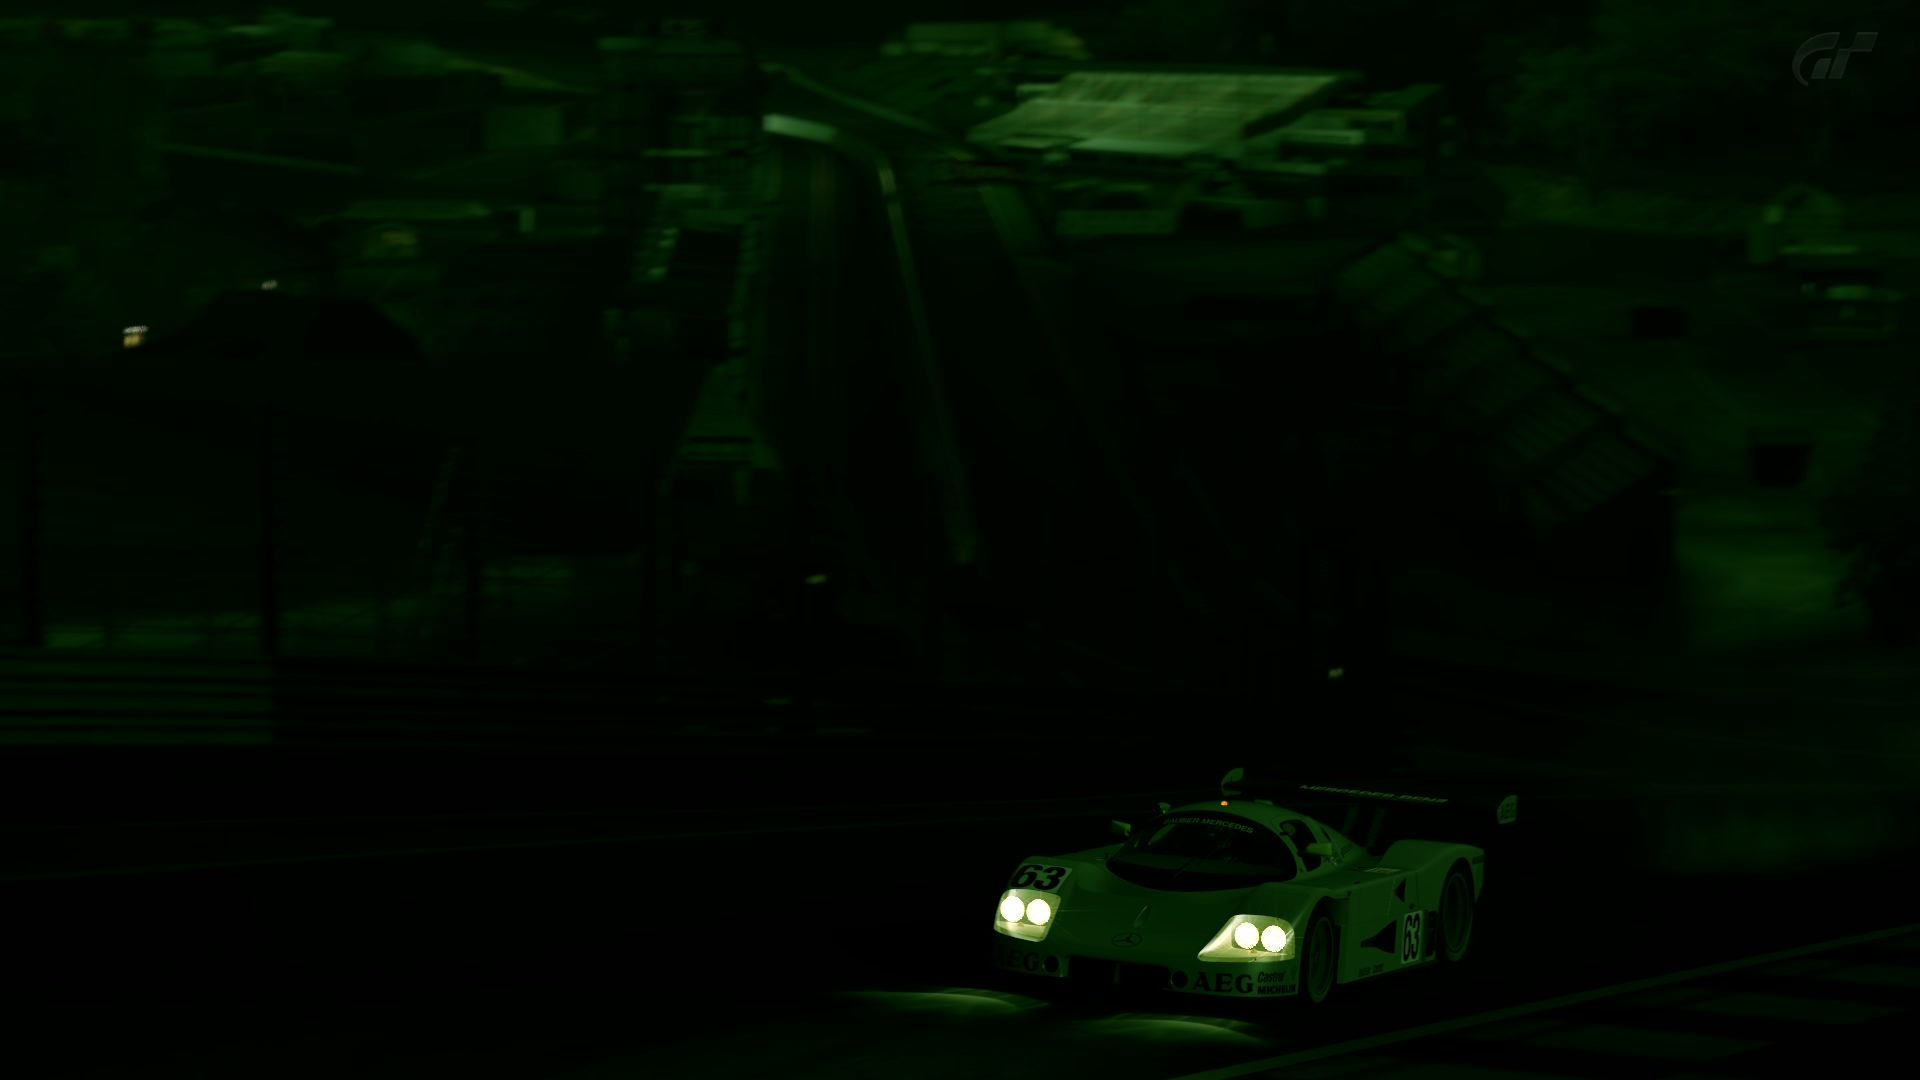 Circuit de Spa-Francorchamps_36.jpg